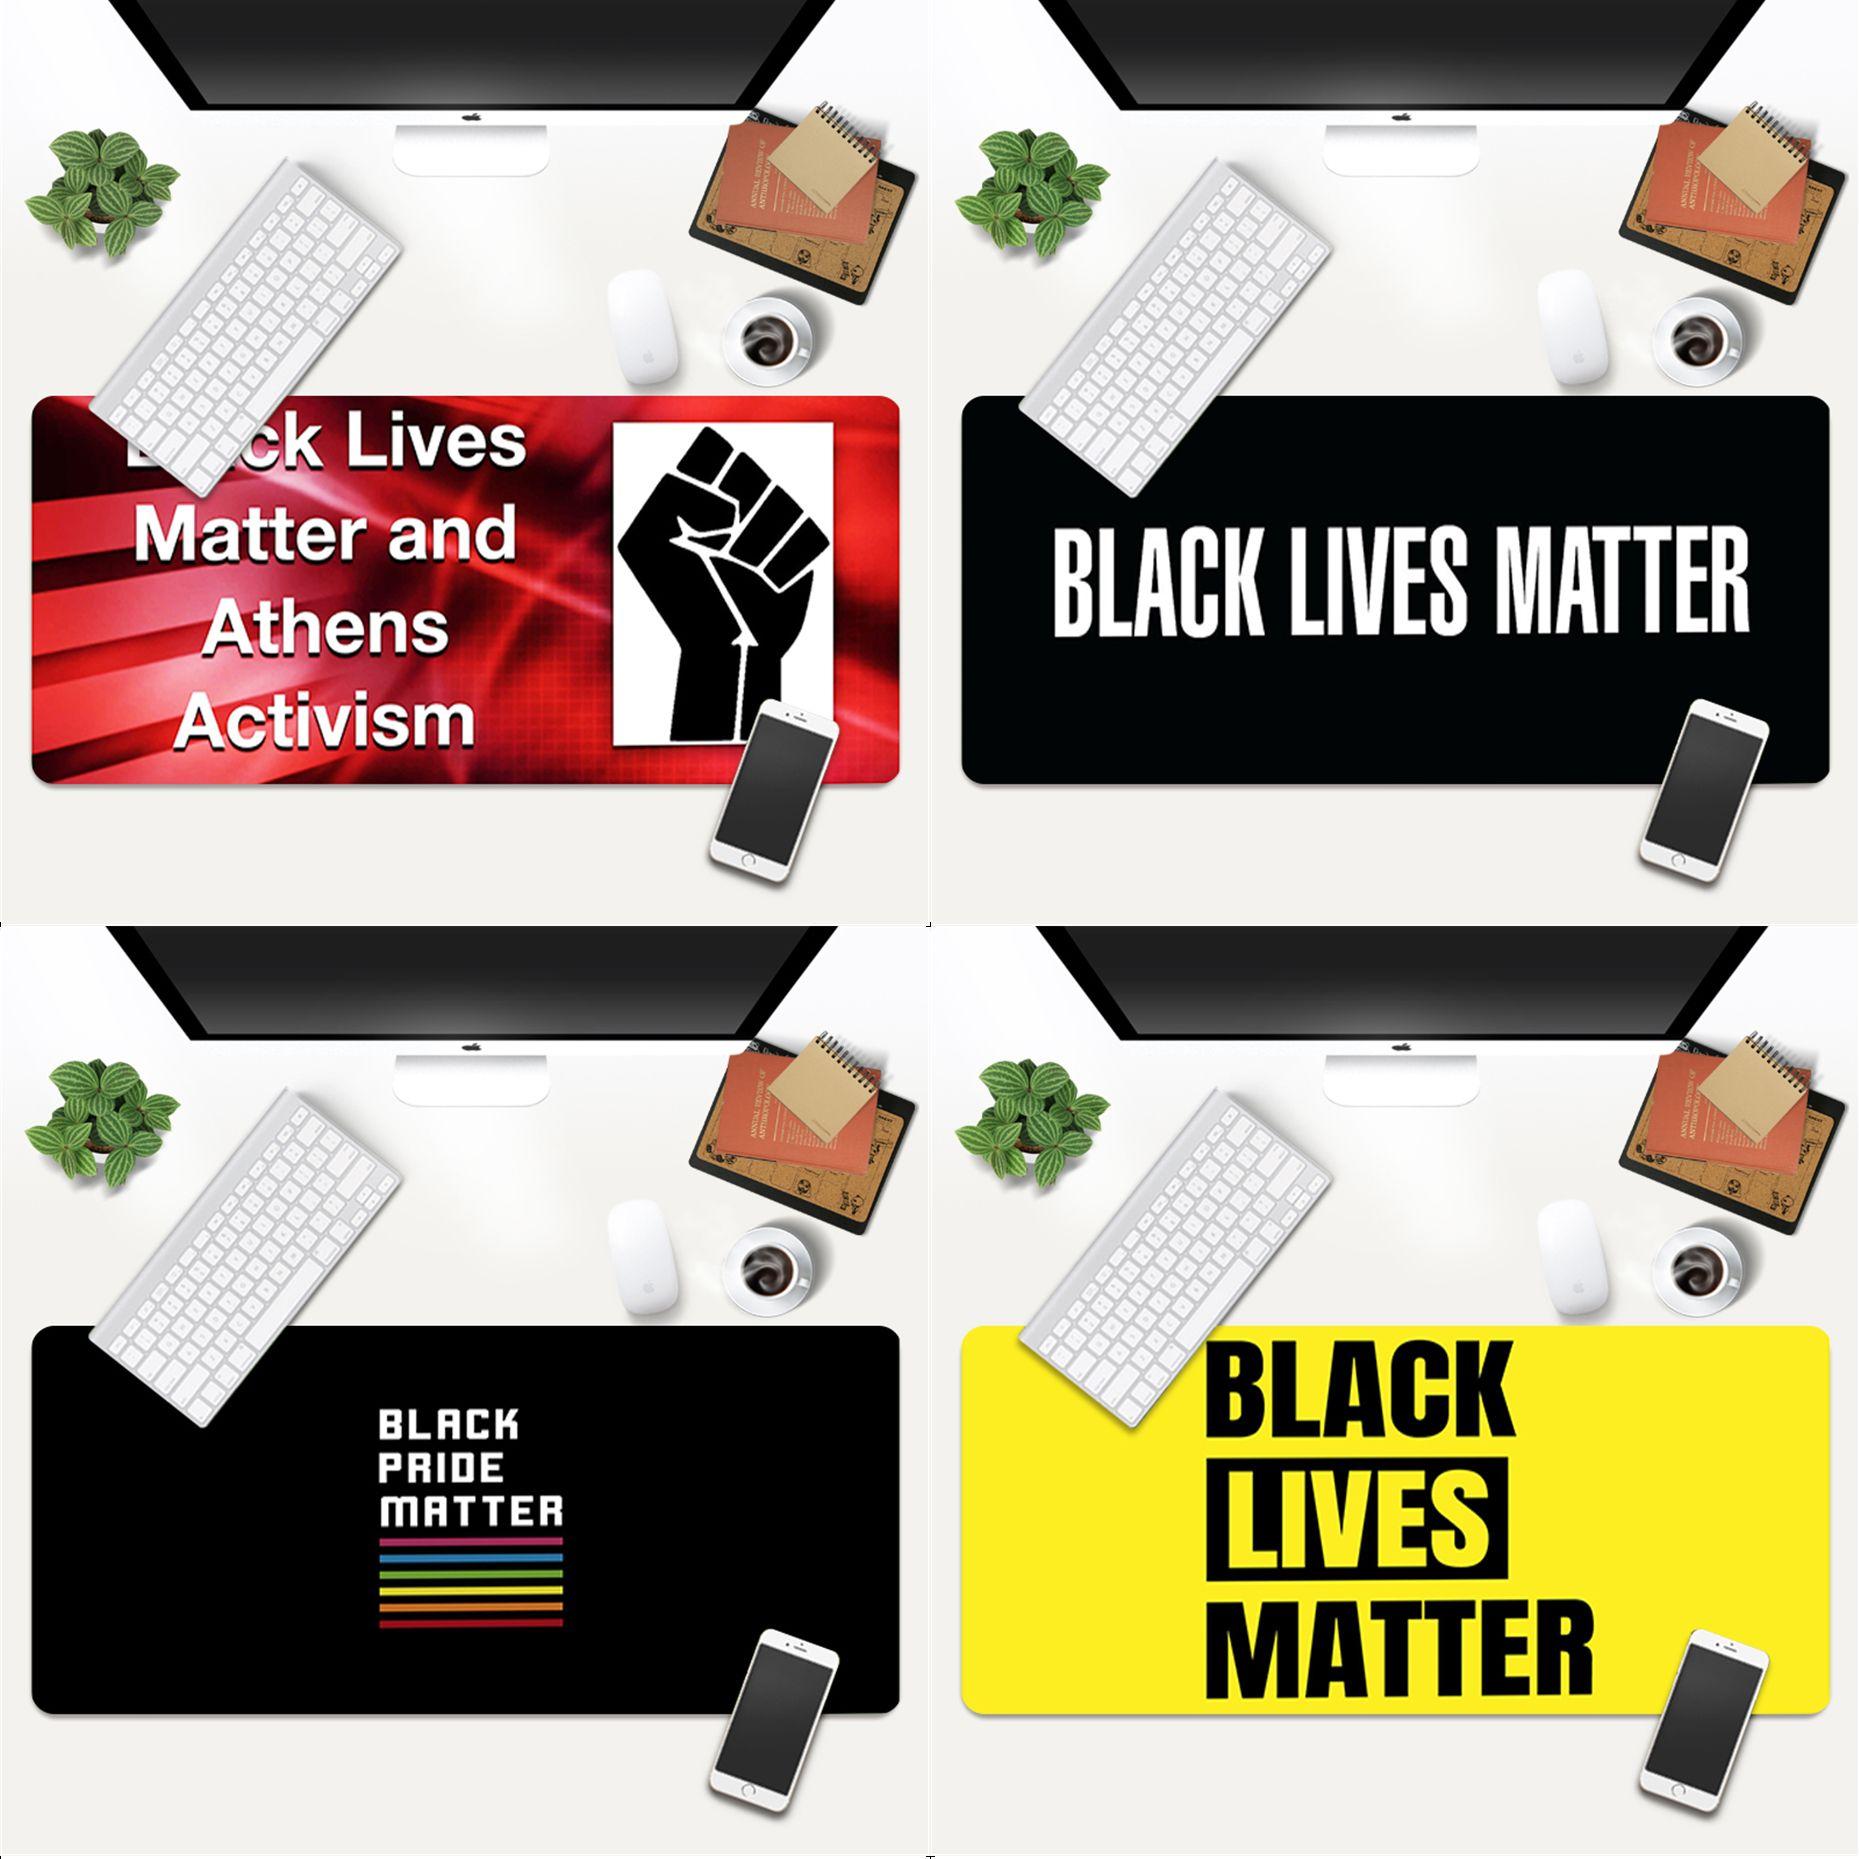 MaiYaCa Cool New Black Lives Matter gamer play mats Mousepad Gaming Mouse Pad Large Deak Mat 700x300mm for overwatch/cs go maiyaca 2018 new persian rugs mouse pad gamer play mats size for 180x220x2mm and 250x290x2mm small mousepad